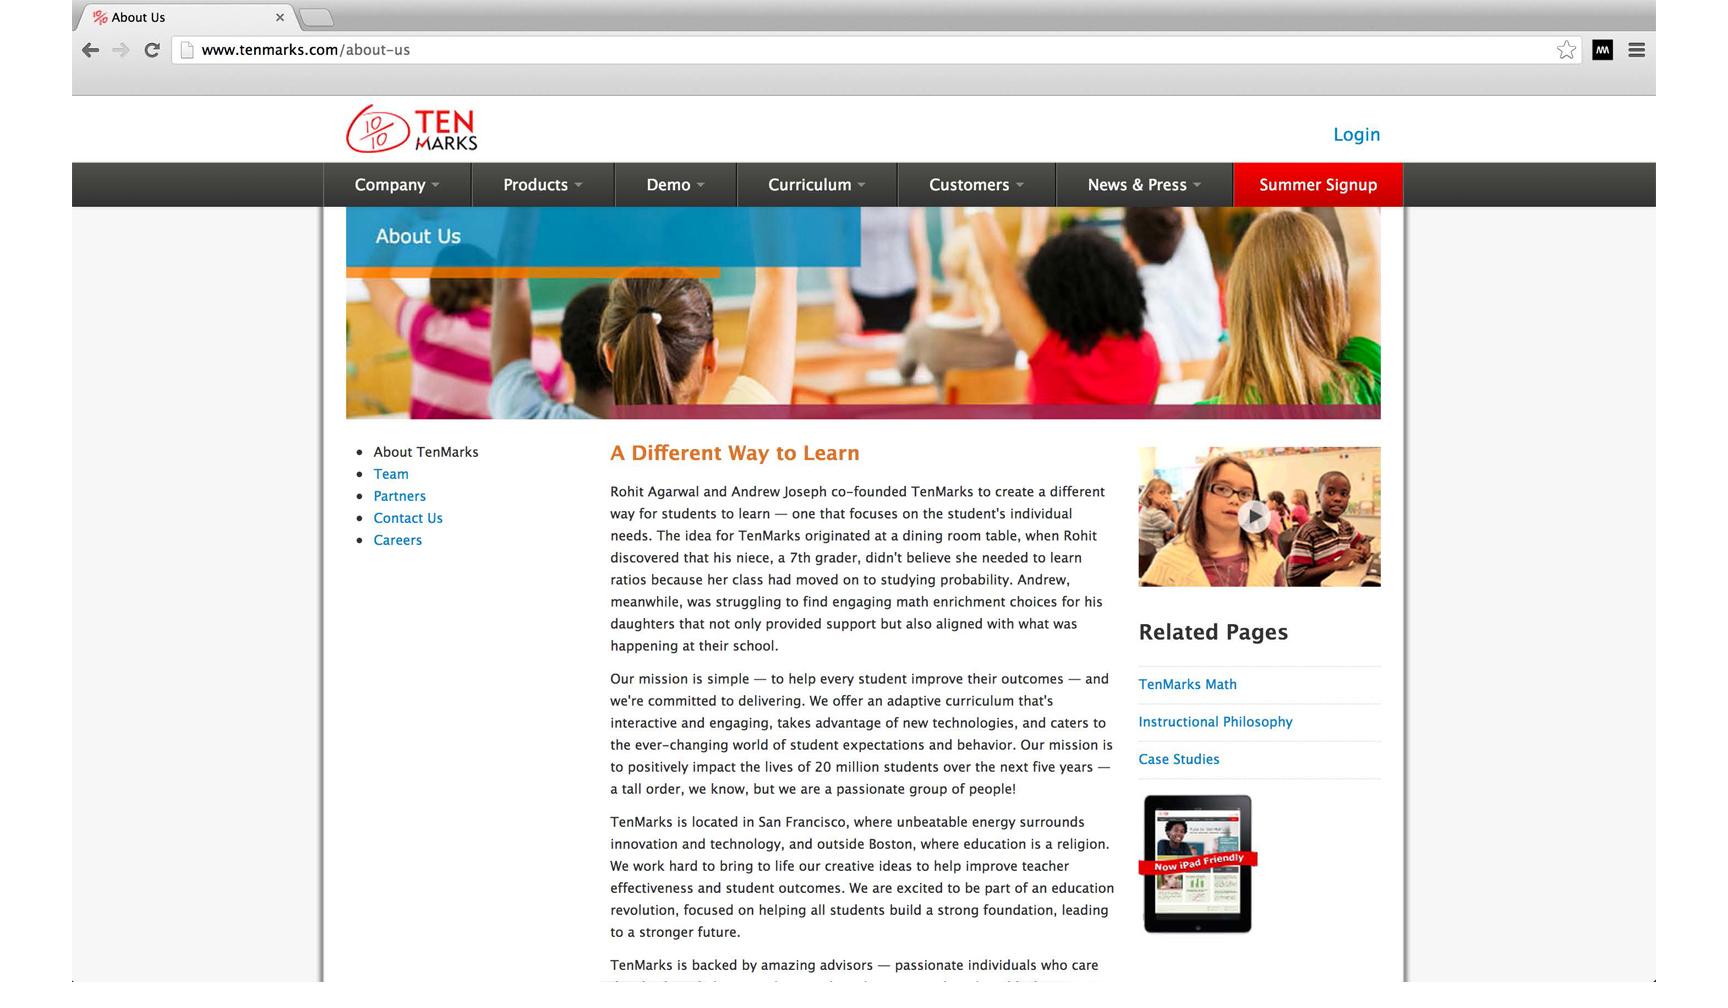 tenmarks_website_1.jpg